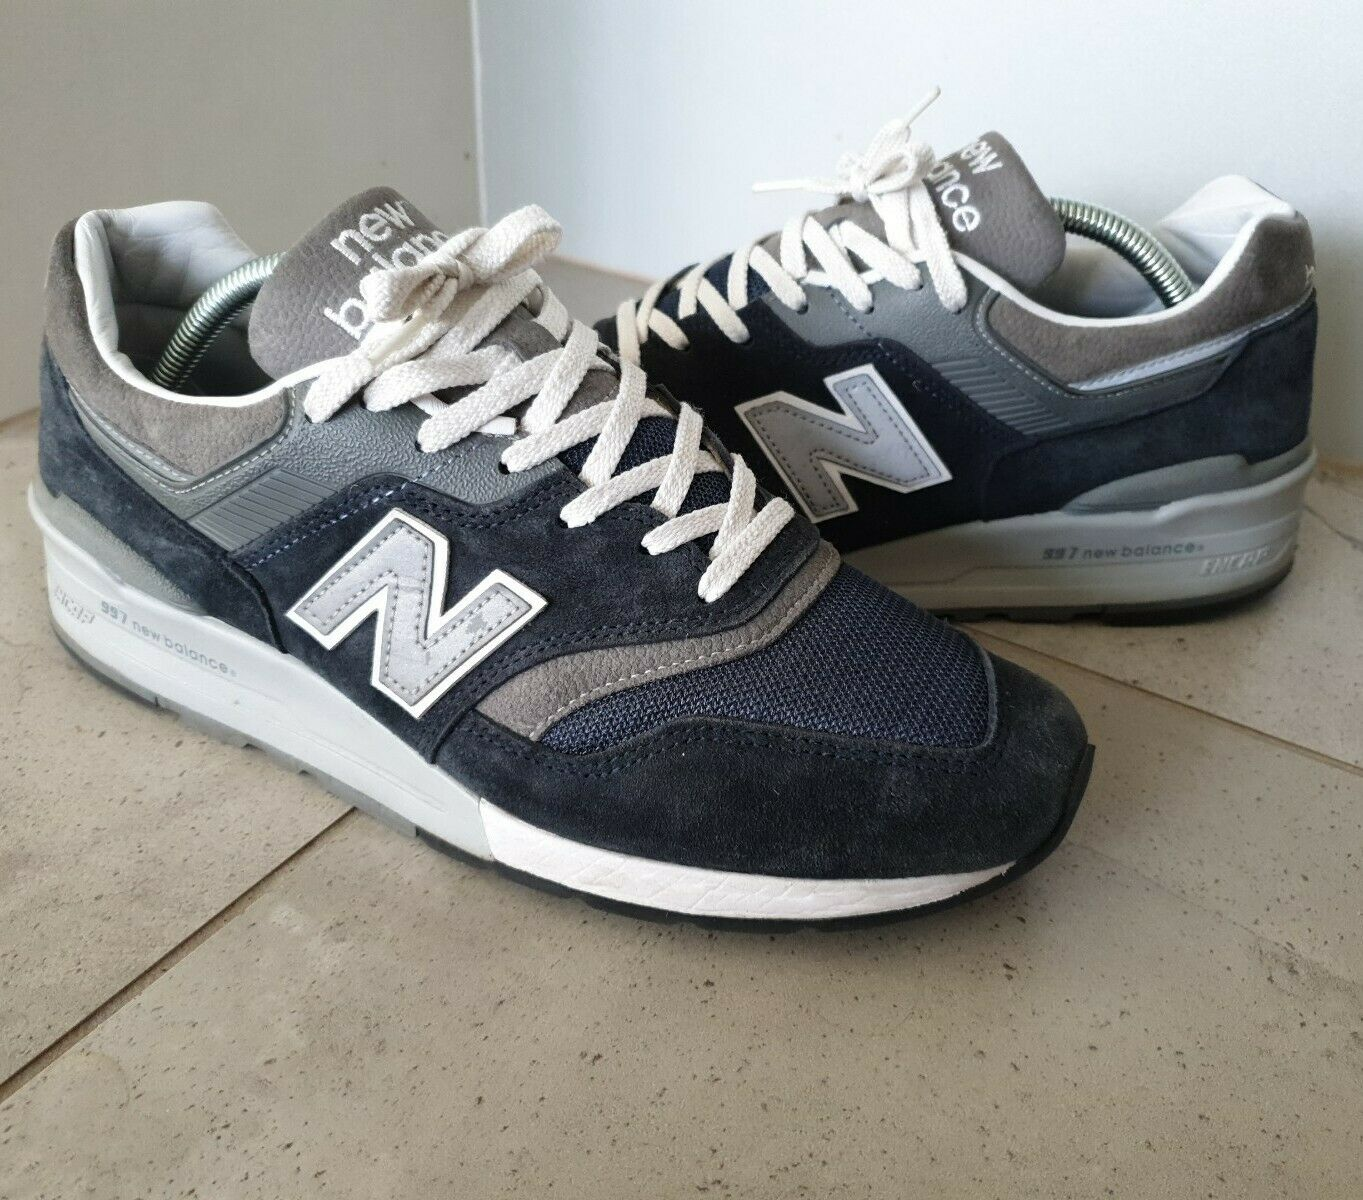 Made in USA New Balance 997 M997NV Kith 9.5 navy gray white 1500 998 9 blue